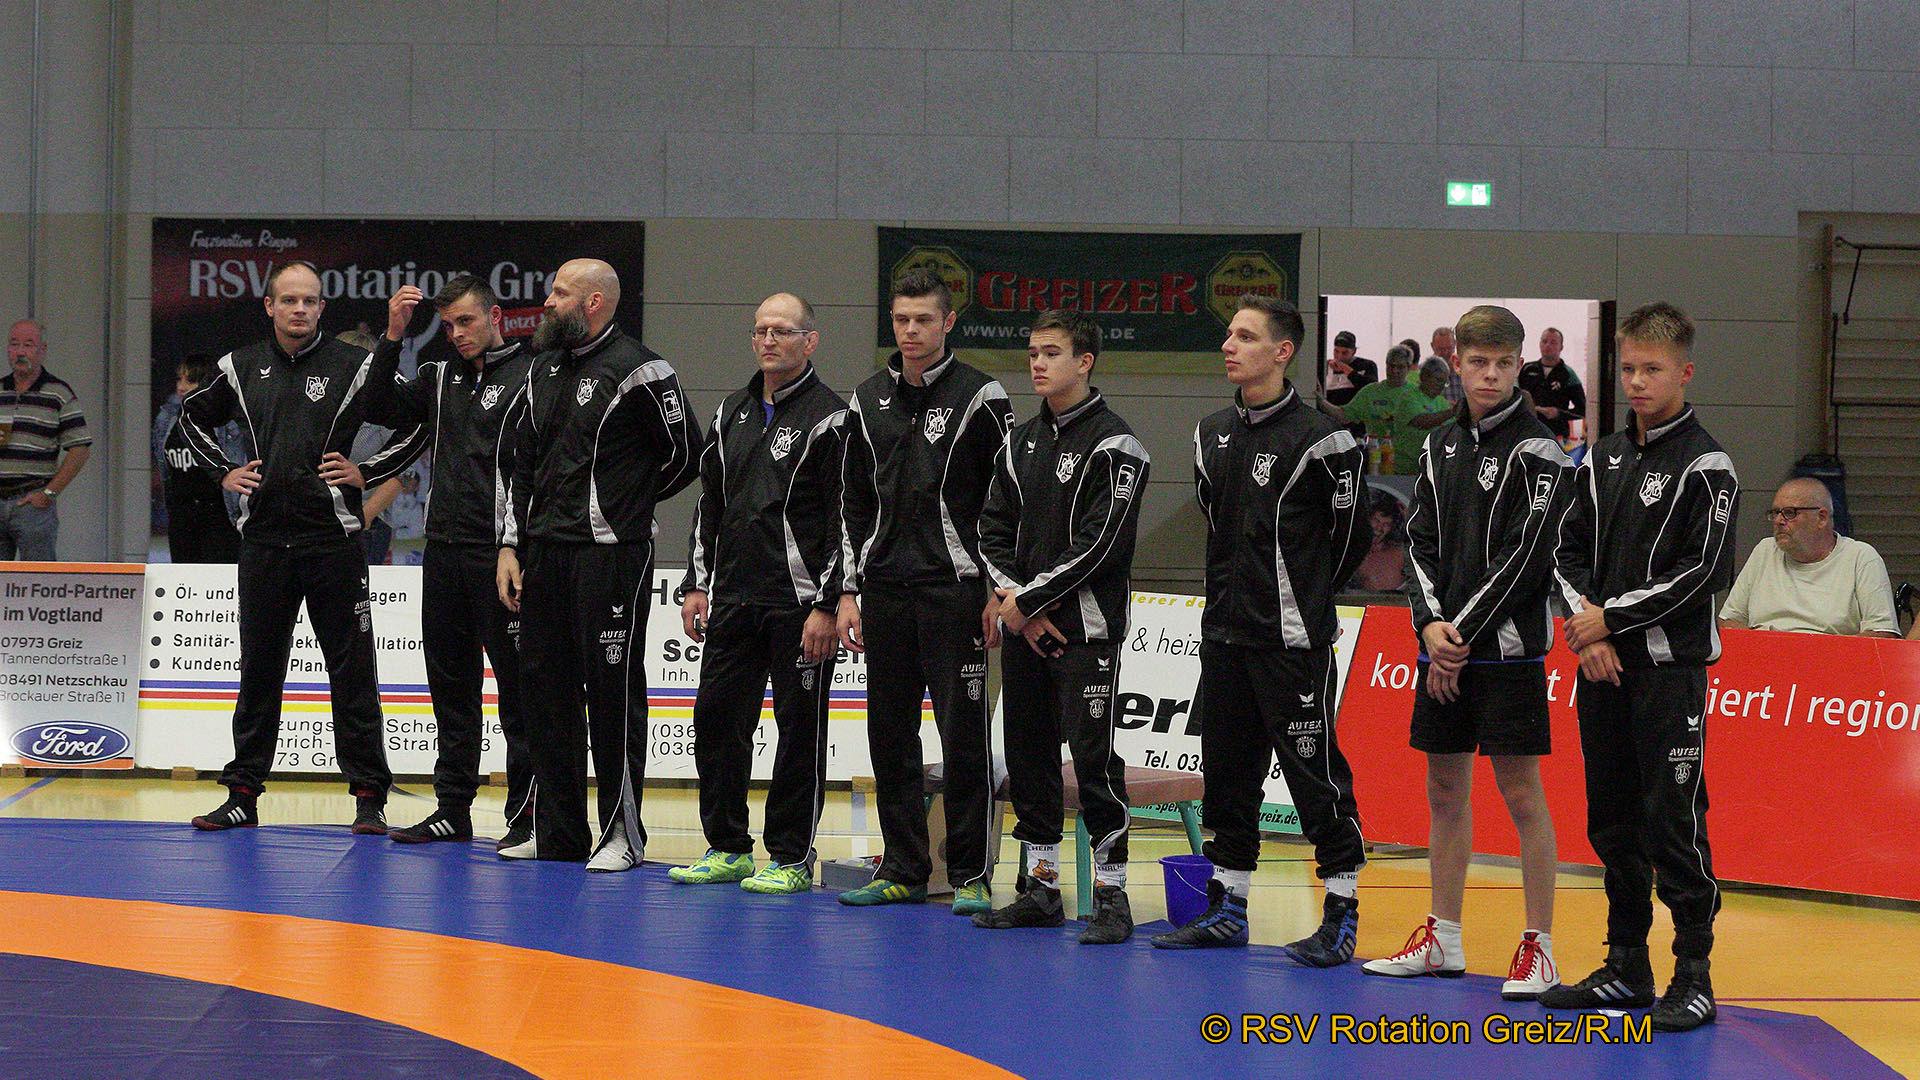 Landesliga Sachsen: RSV Rotation Greiz II gegen RV Thalheim II endet 21:3